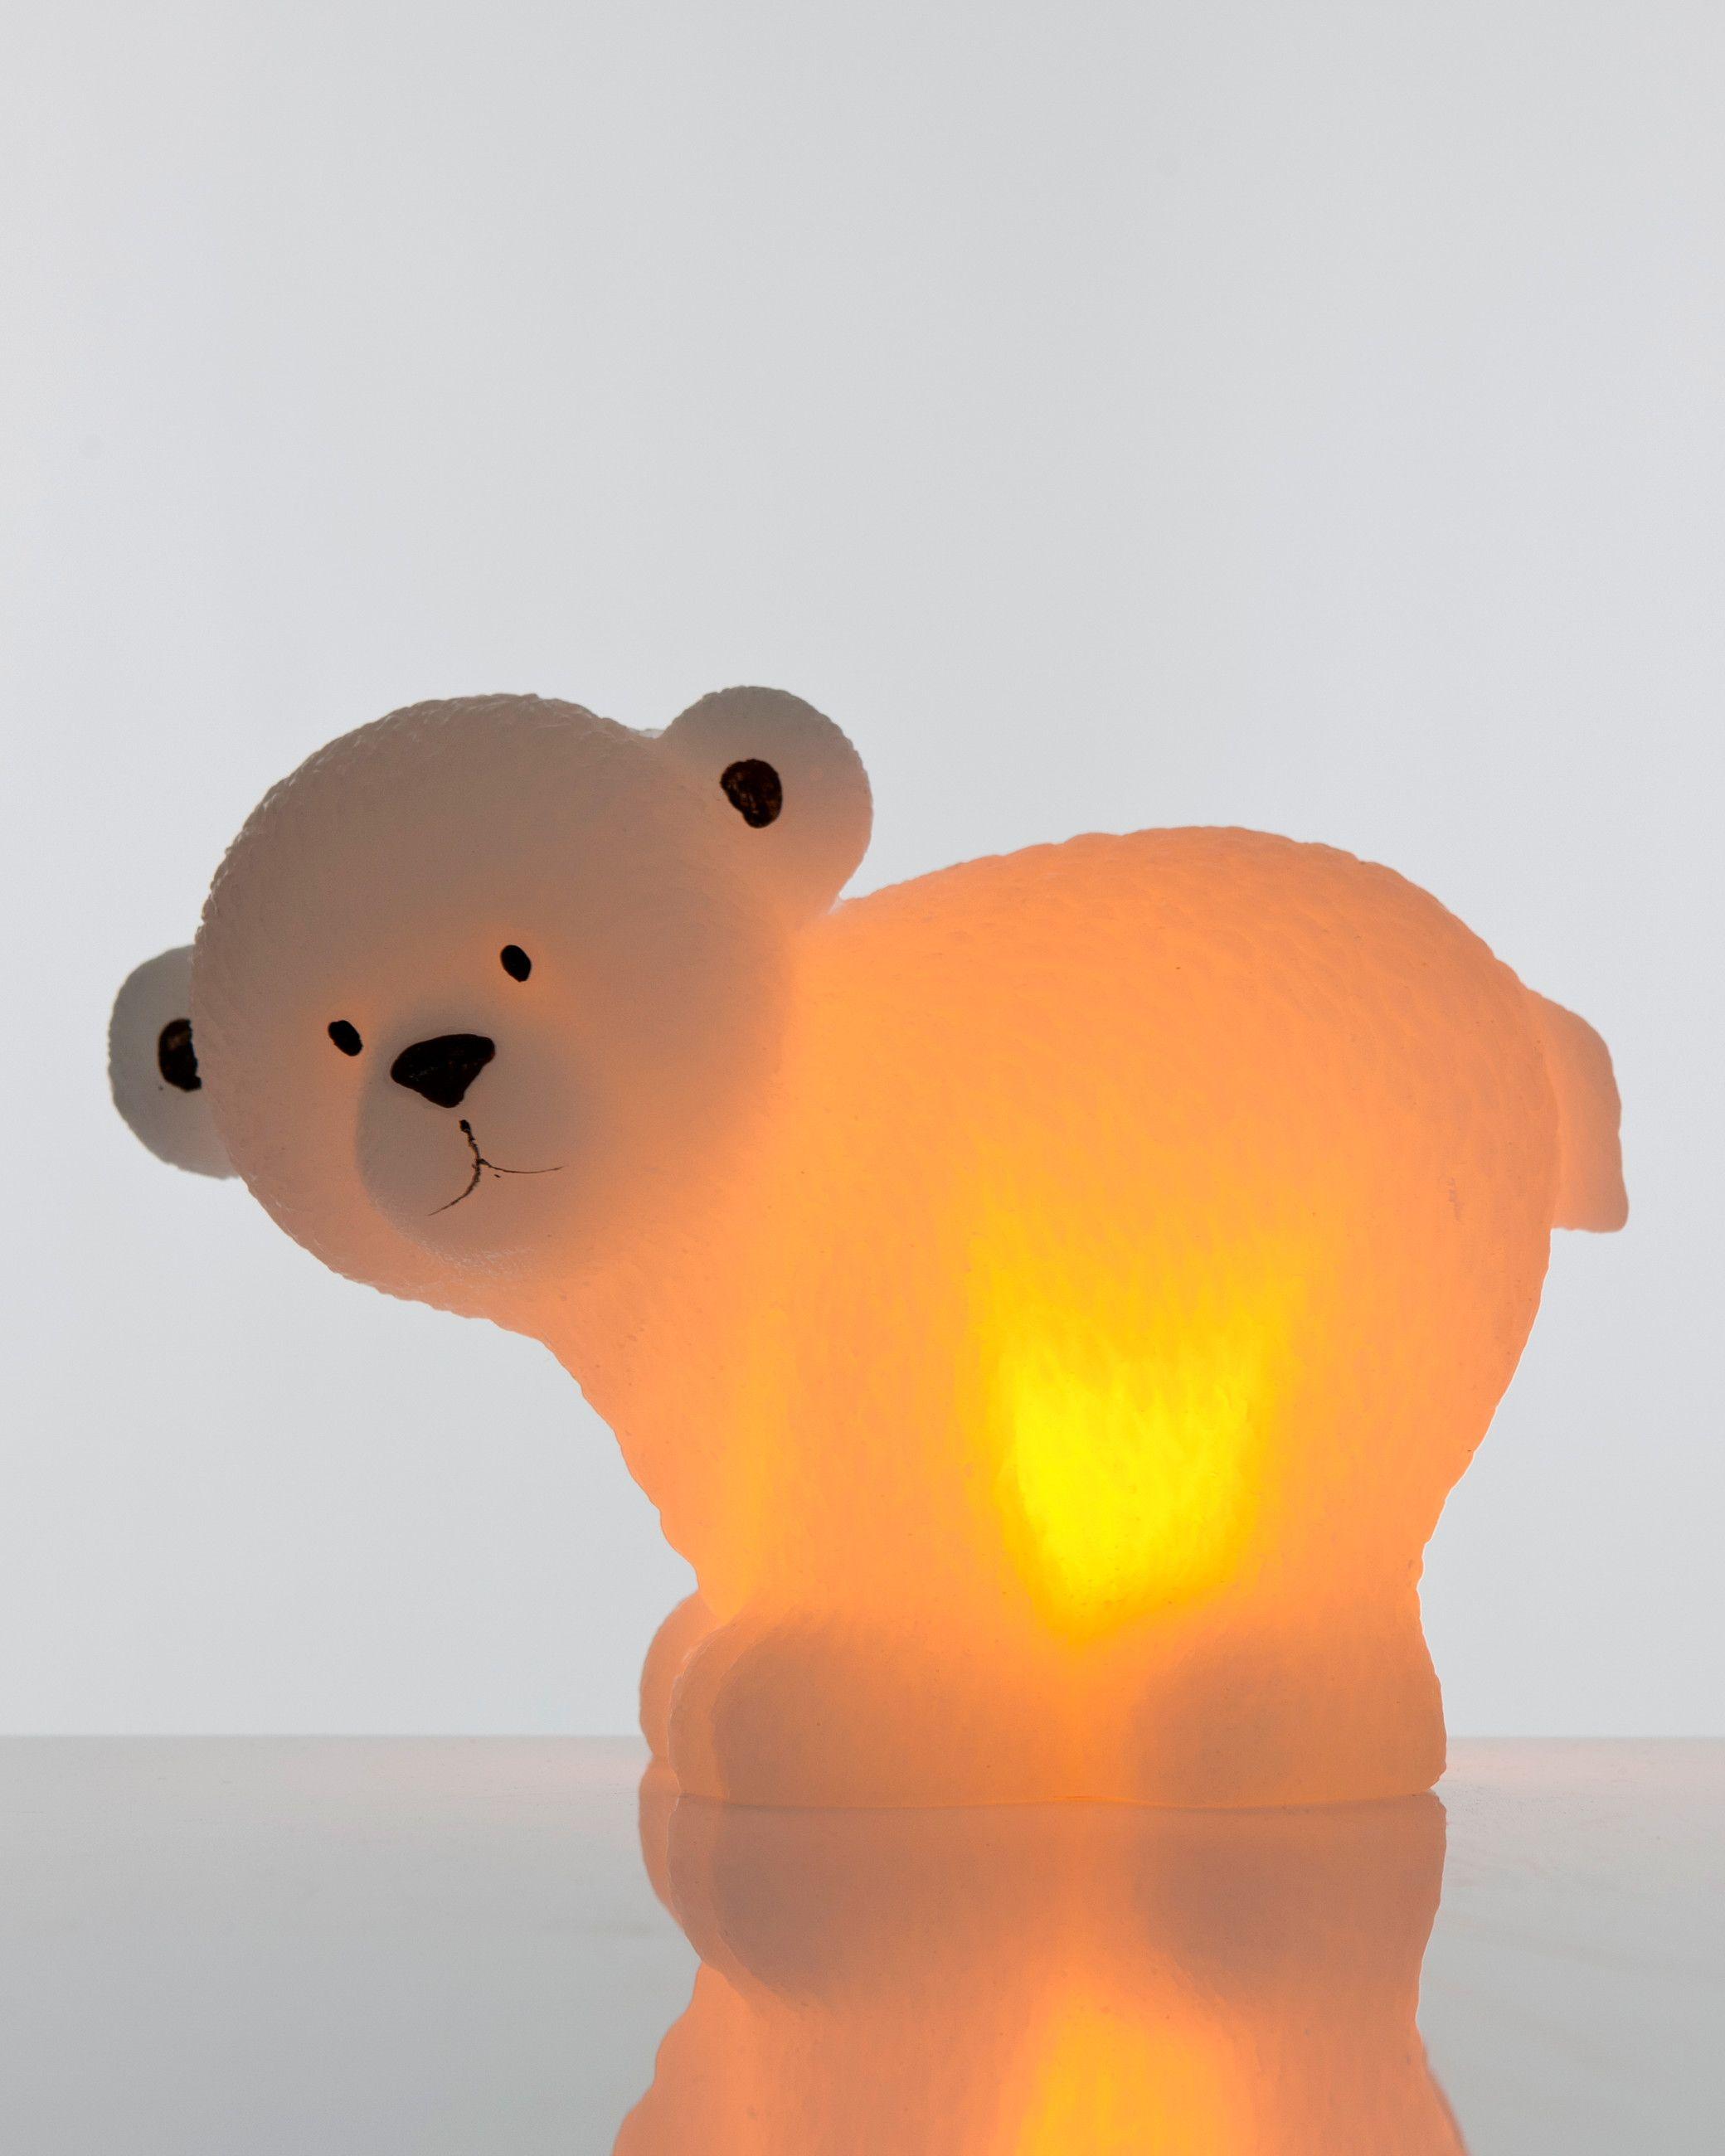 flambiance flammenlose kerze polarb r hse24 decor christmas weihnachtszeit. Black Bedroom Furniture Sets. Home Design Ideas